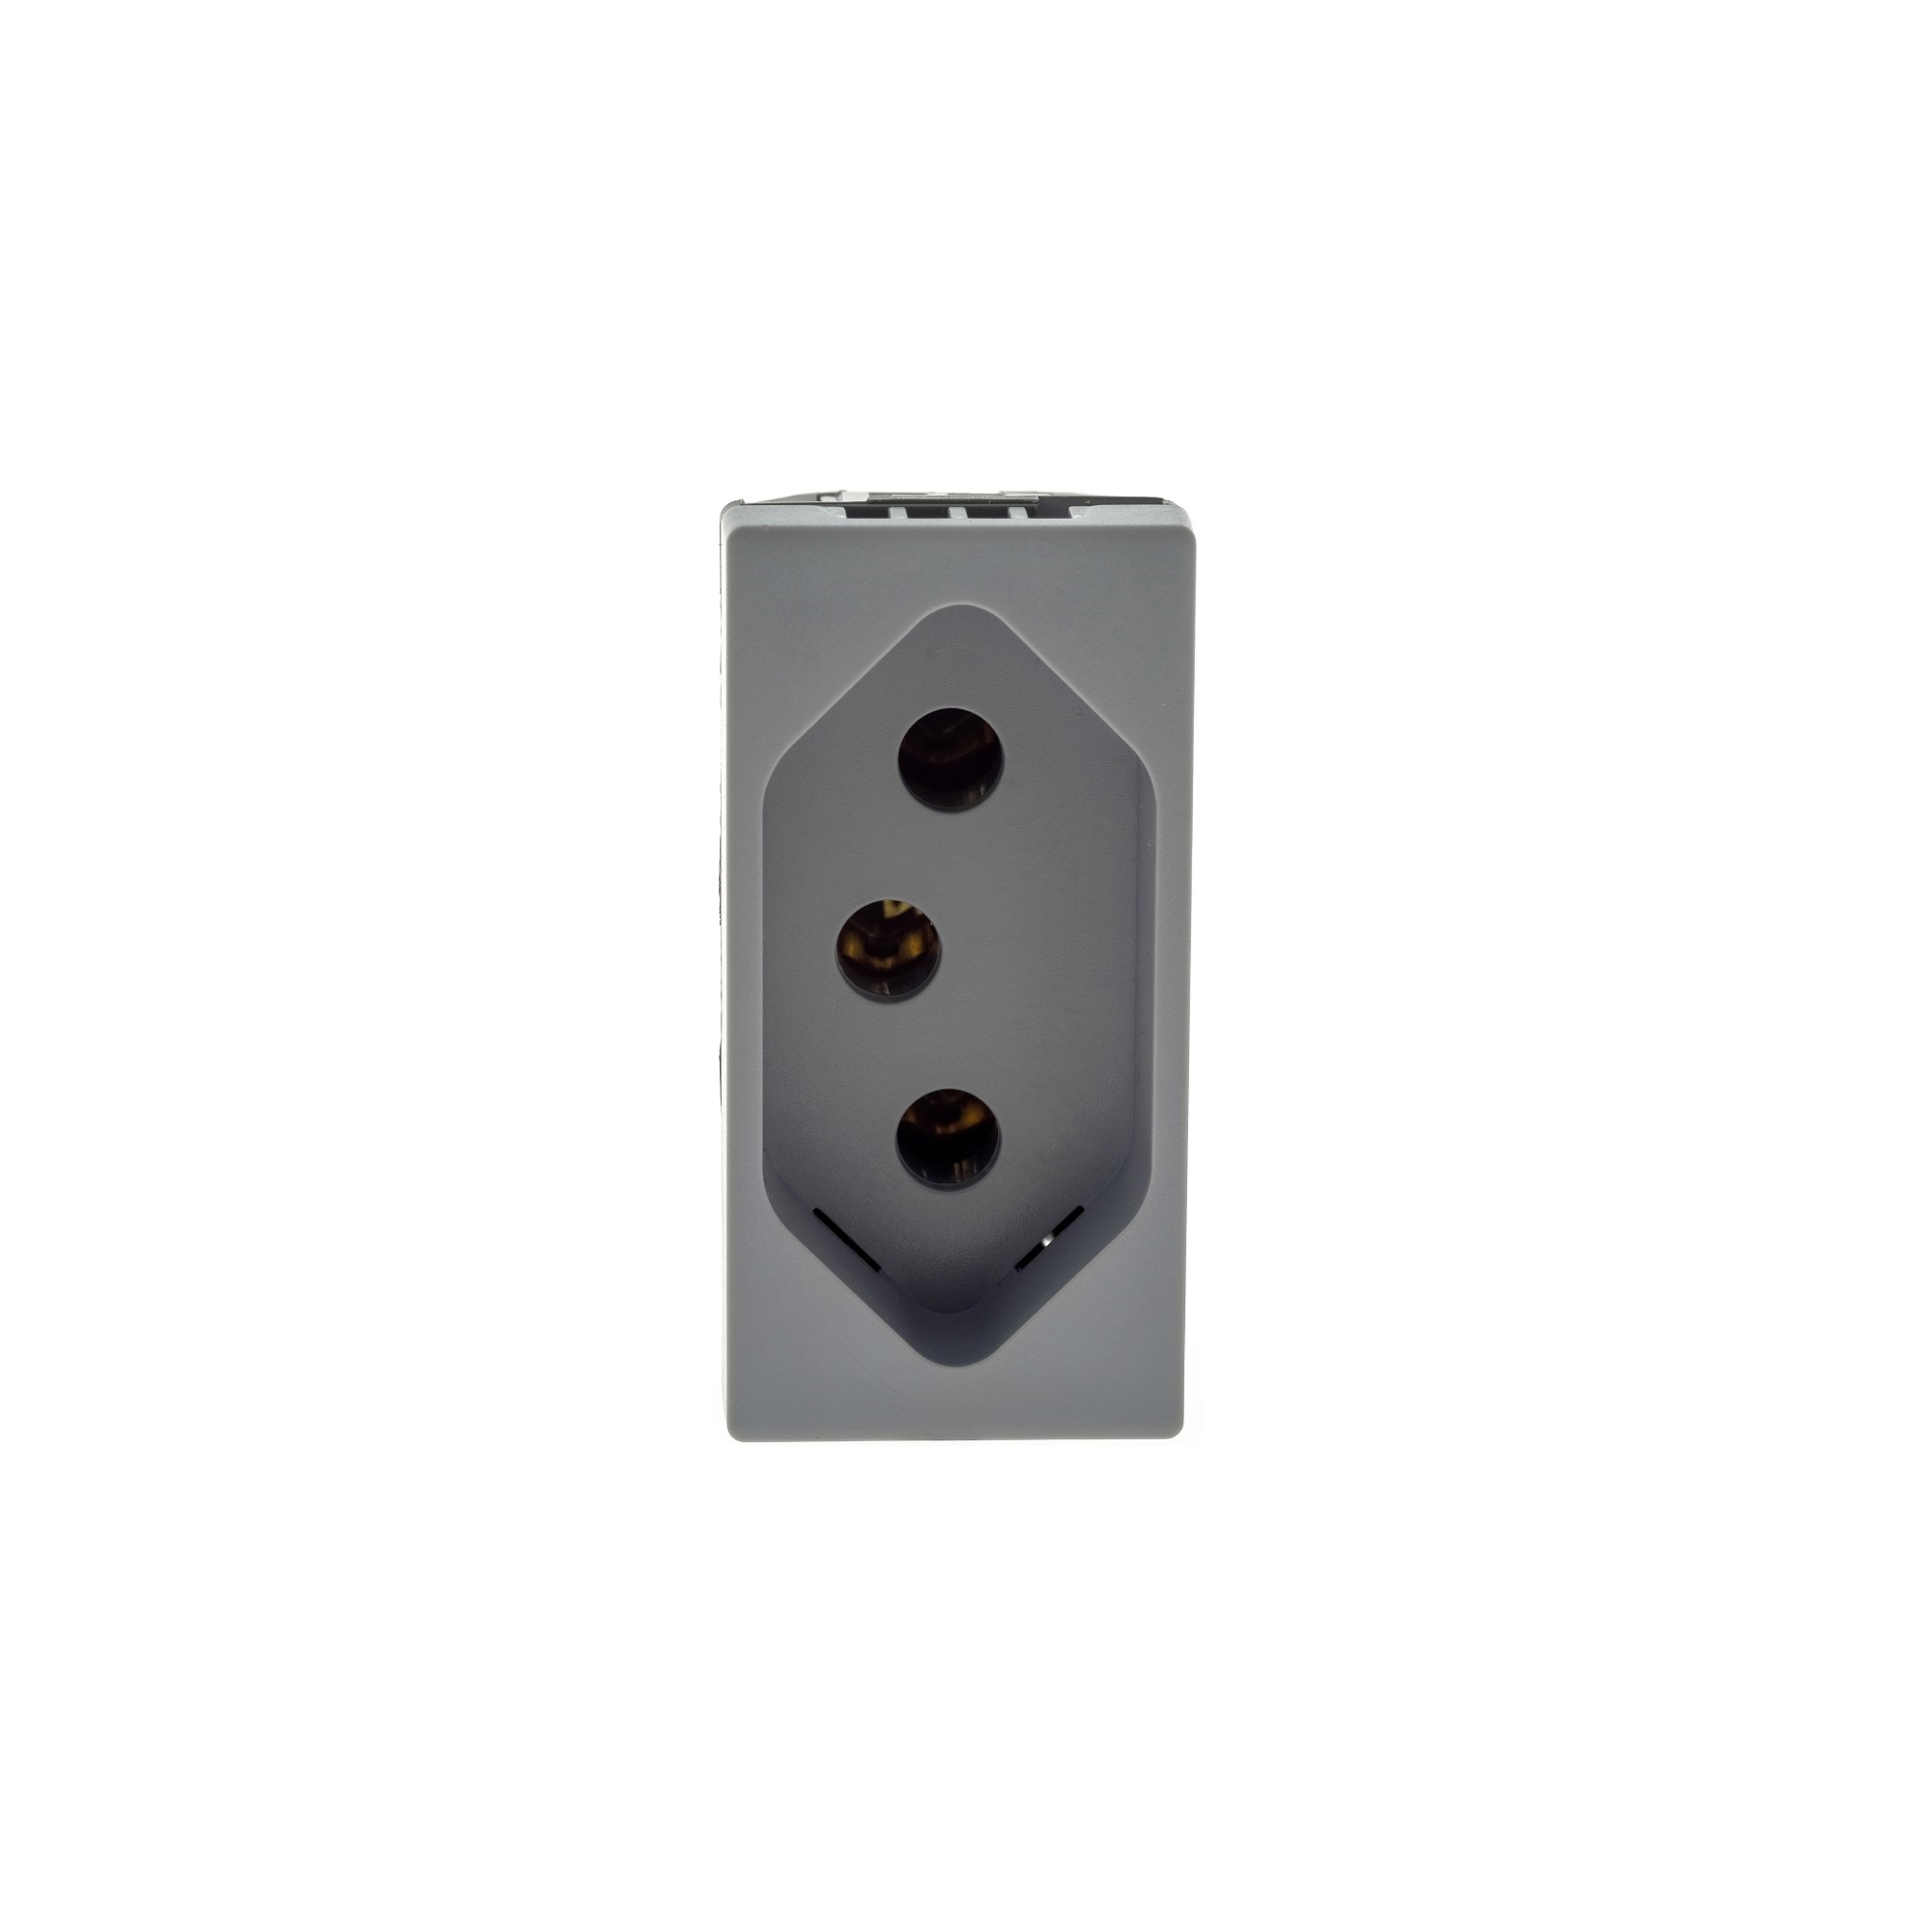 Modulo de Tomada de Energia 1 Modulo 2P T 20A Cinza - Pial Plus - Legrand